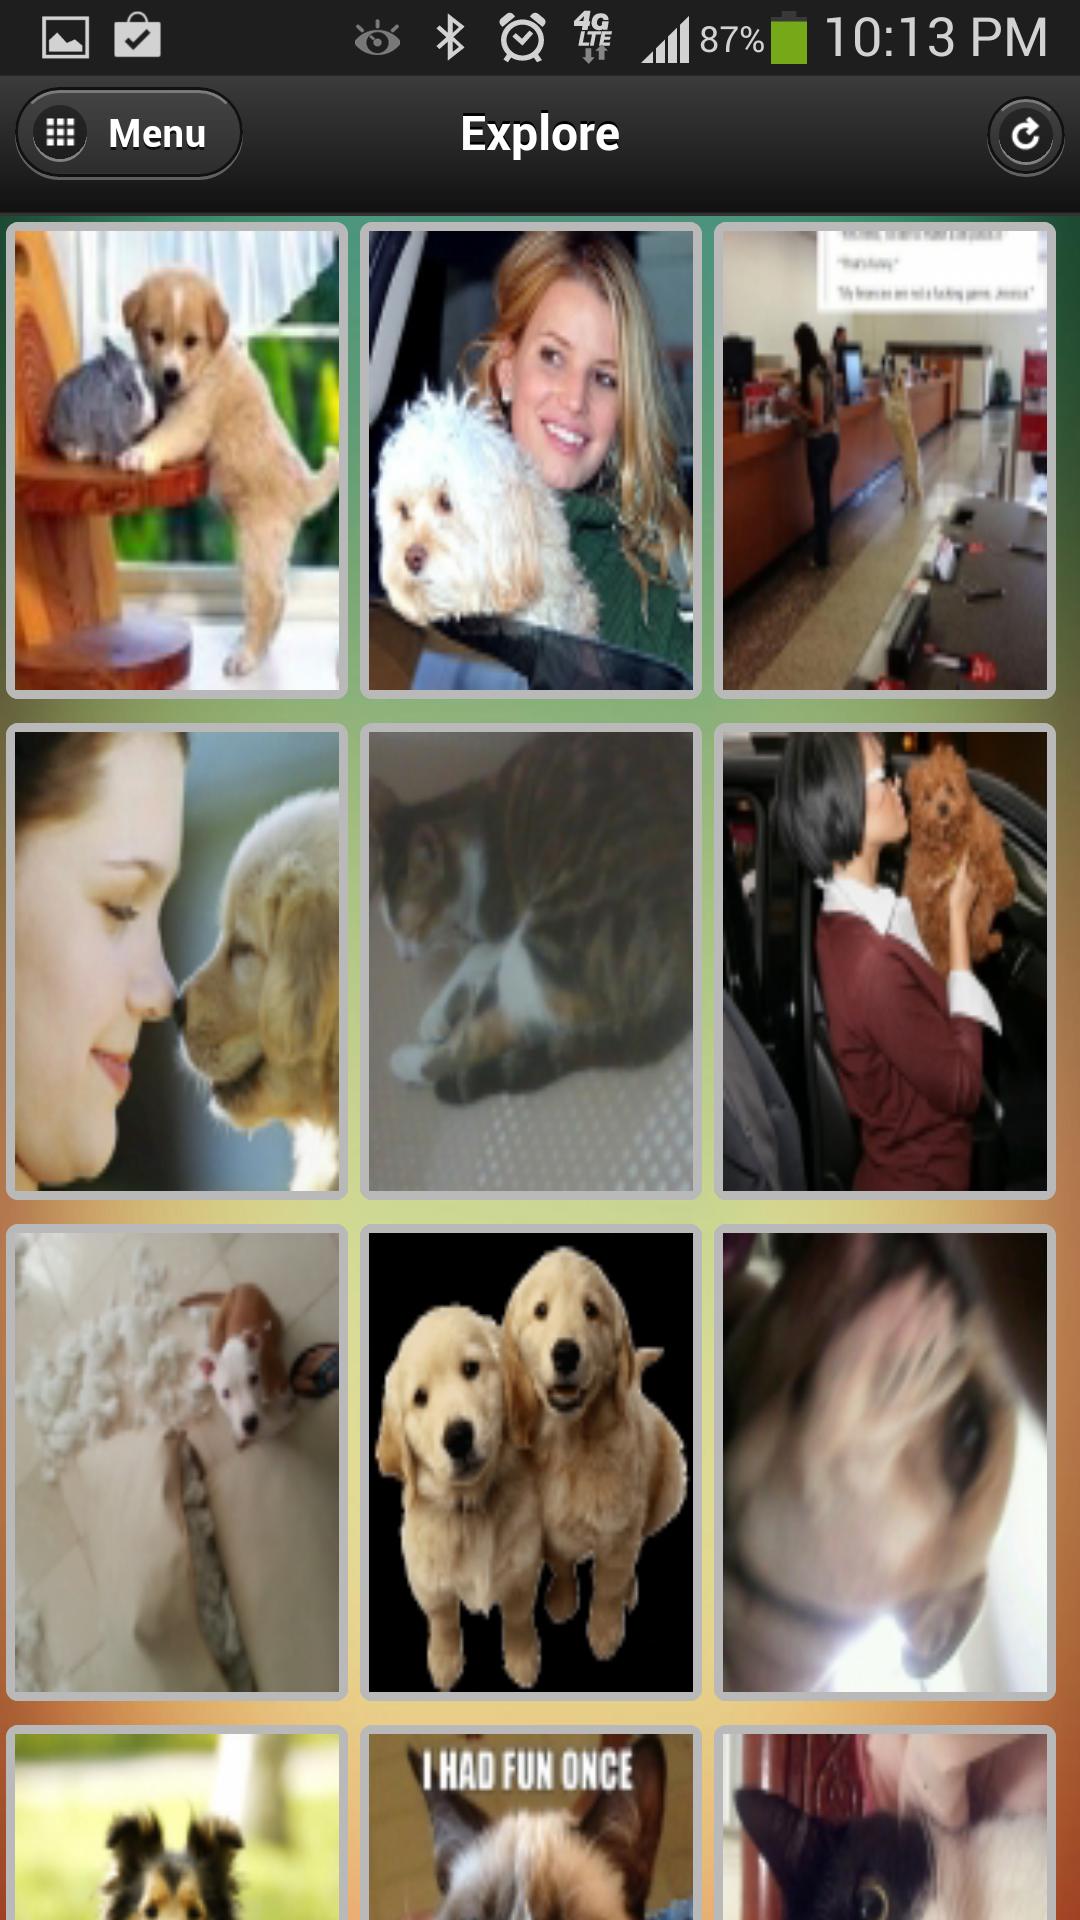 POMP Pics Of My Pet - Explore